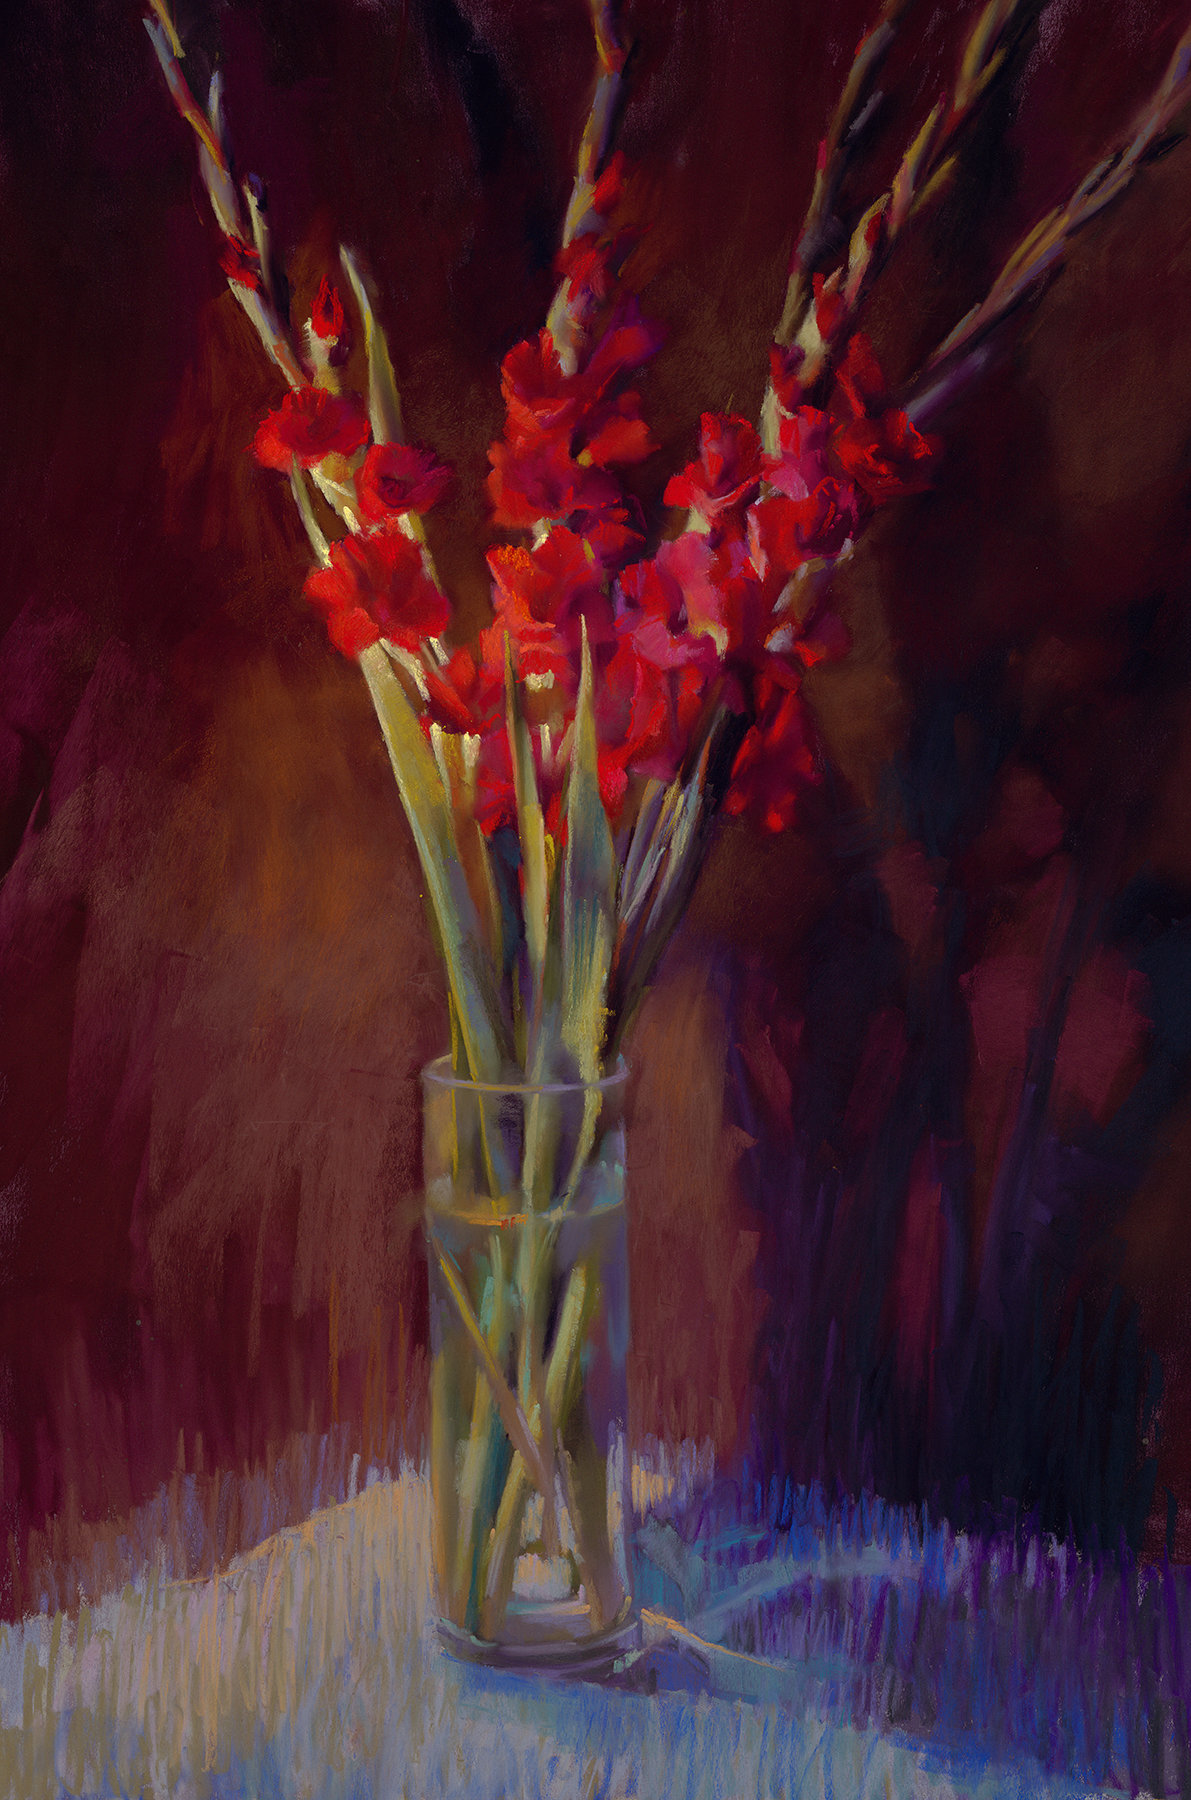 Red Gladiolus By Cathy Locke Giclee Print Artful Home